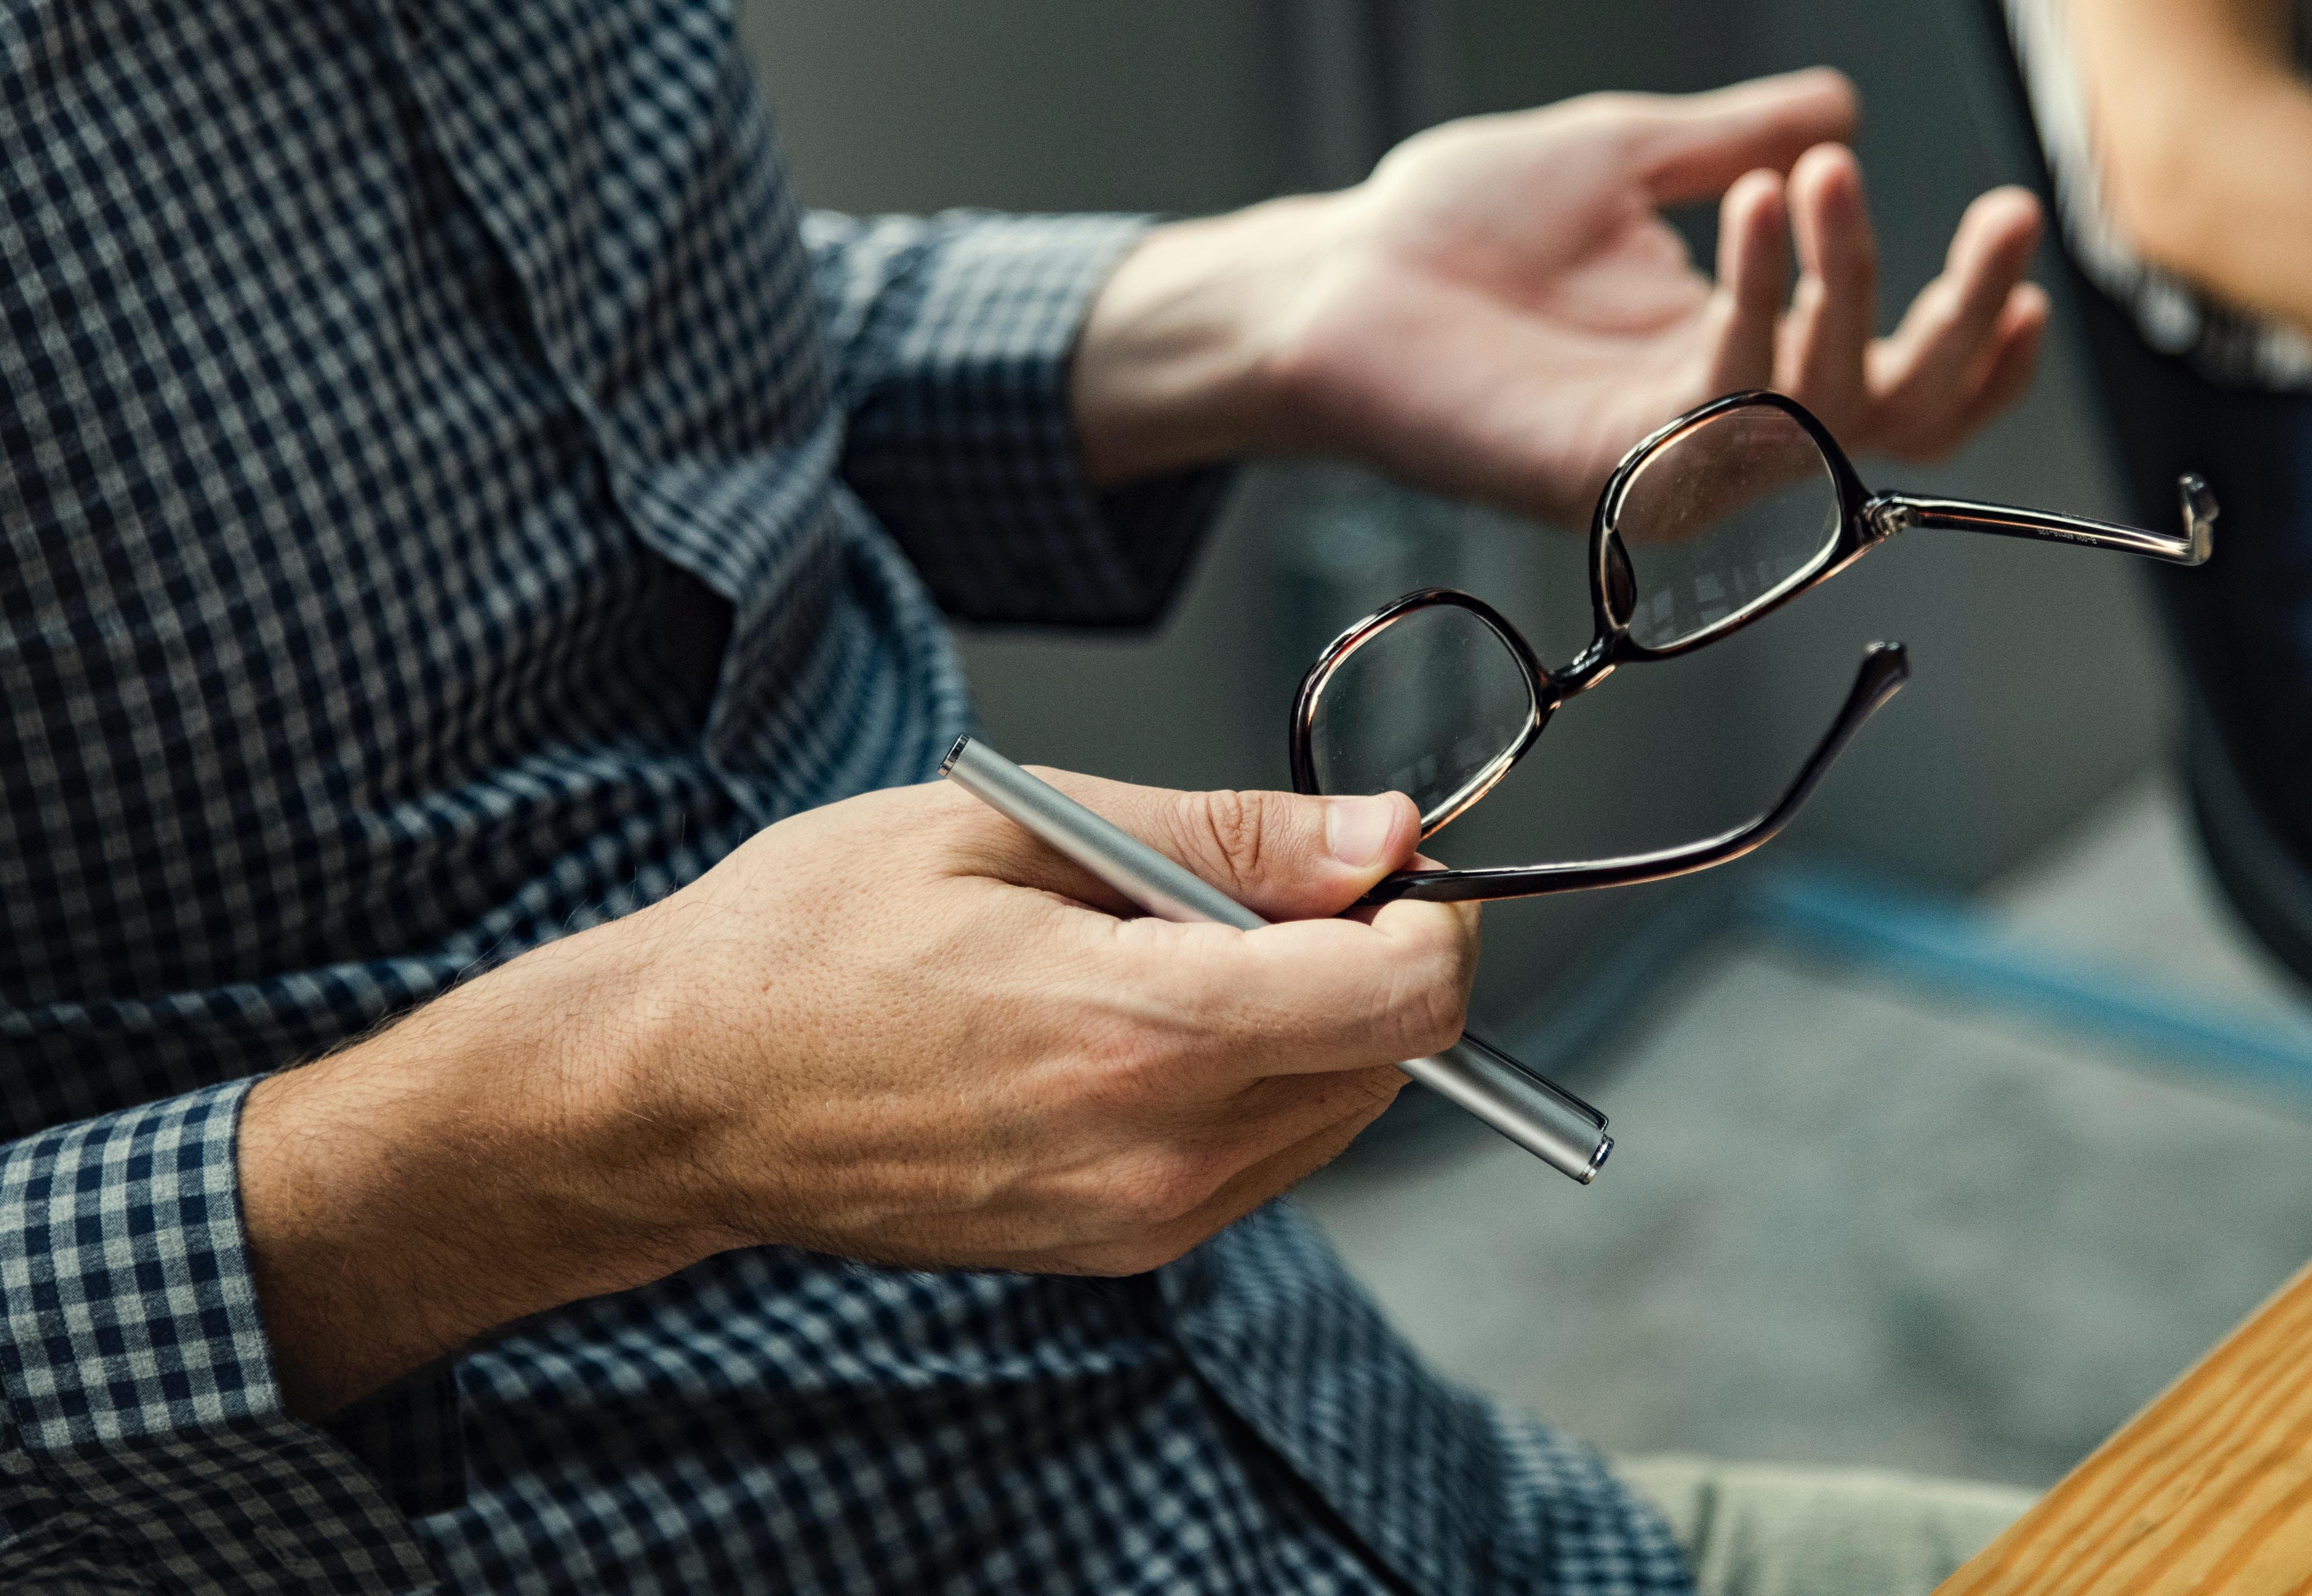 Creating Questions for an Upward Performance Appraisal